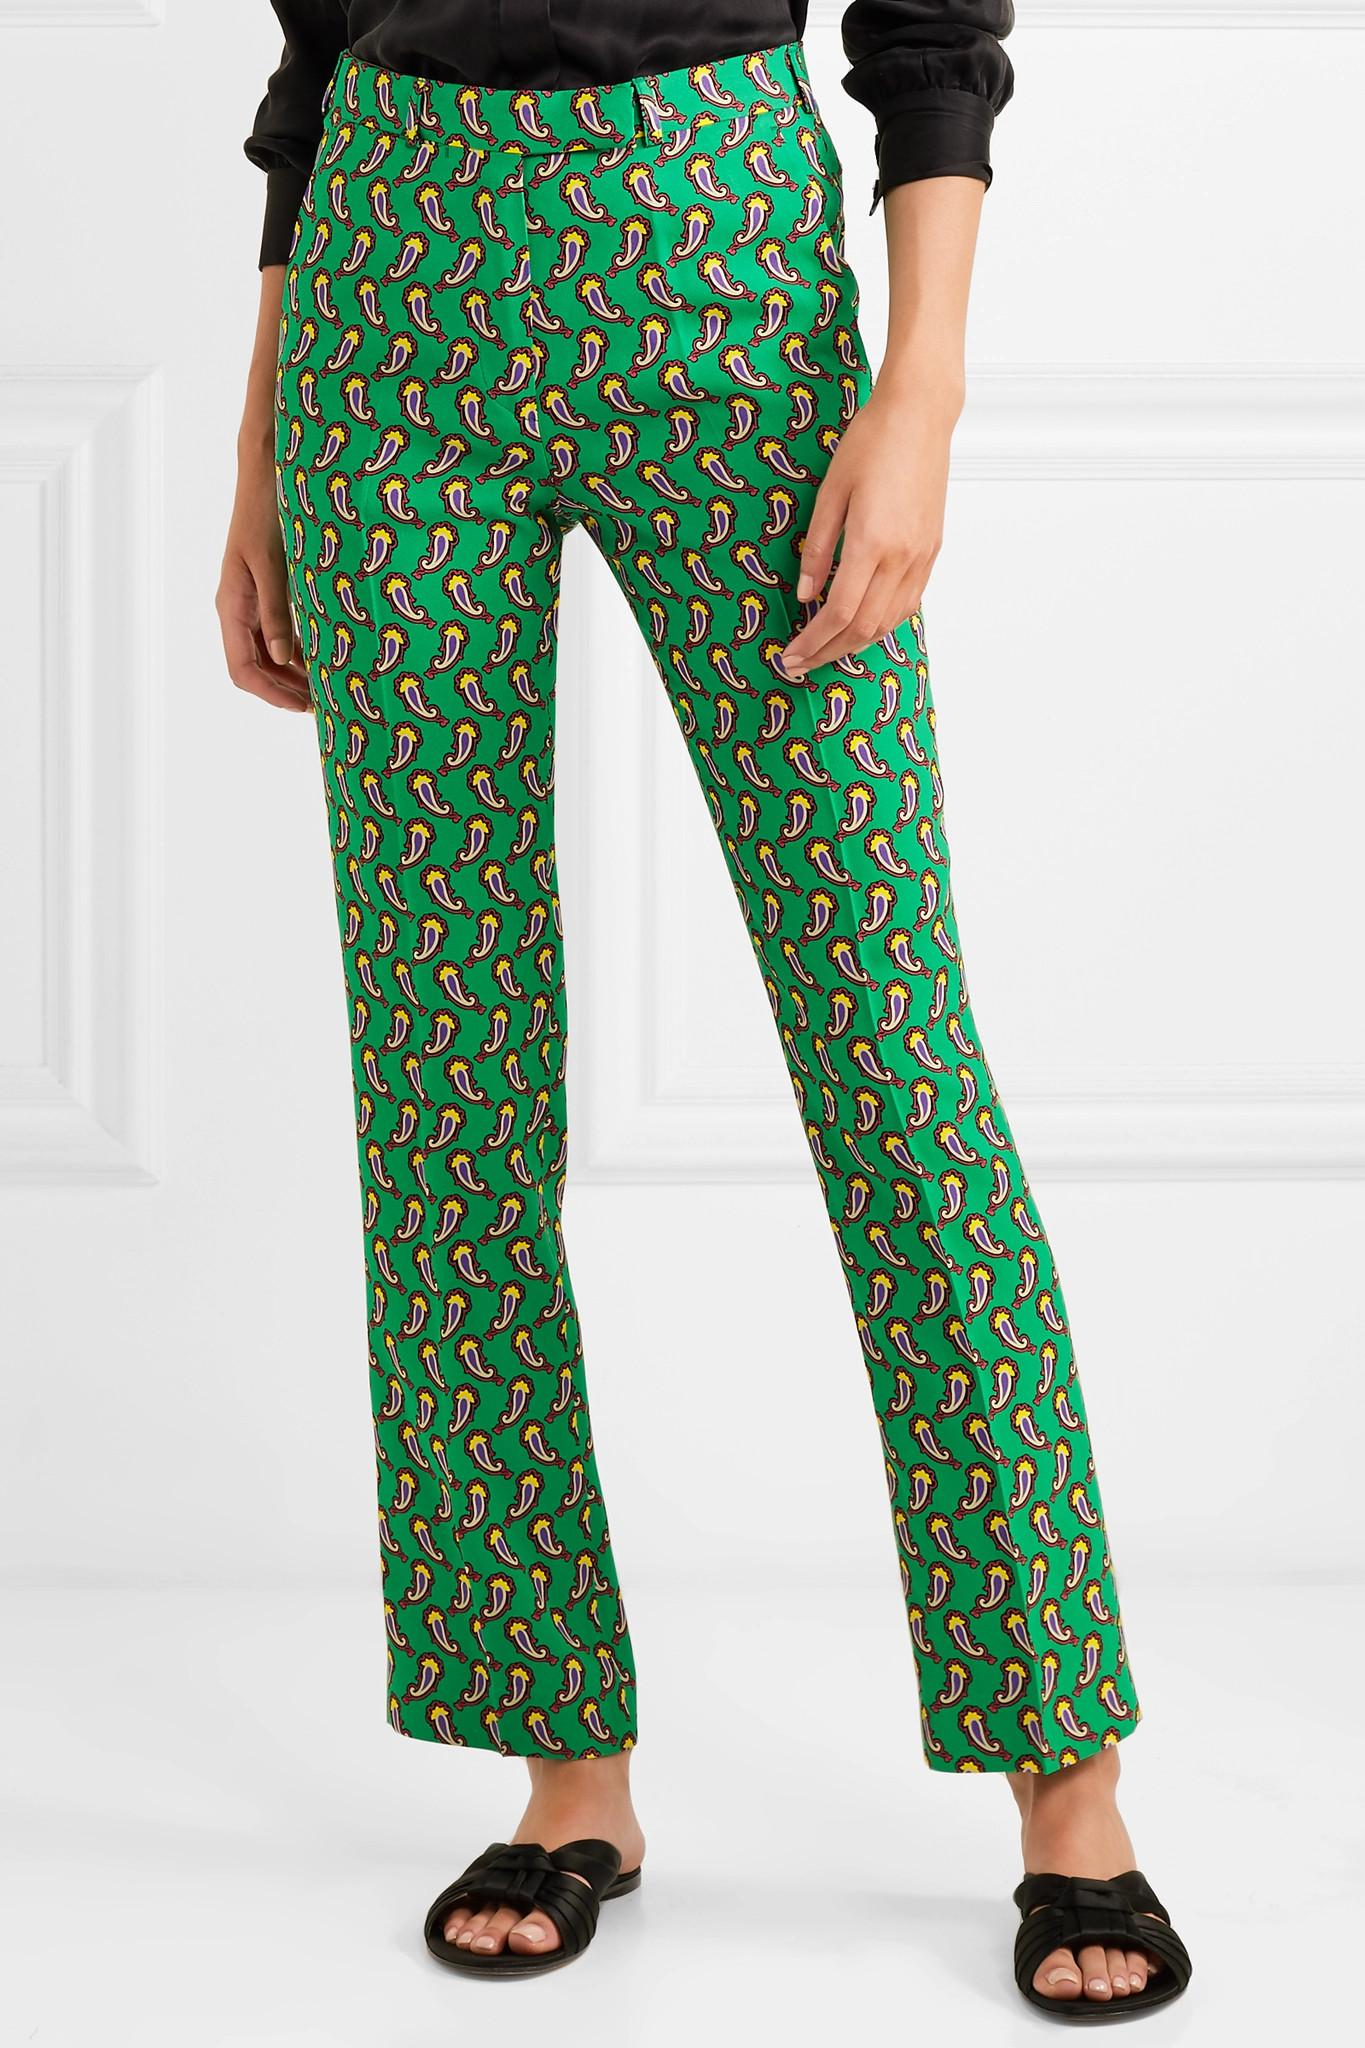 Lyst Vert Raccourci Coloris Slim En Etro Imprimé Pantalon Crêpe 5j3A4RL